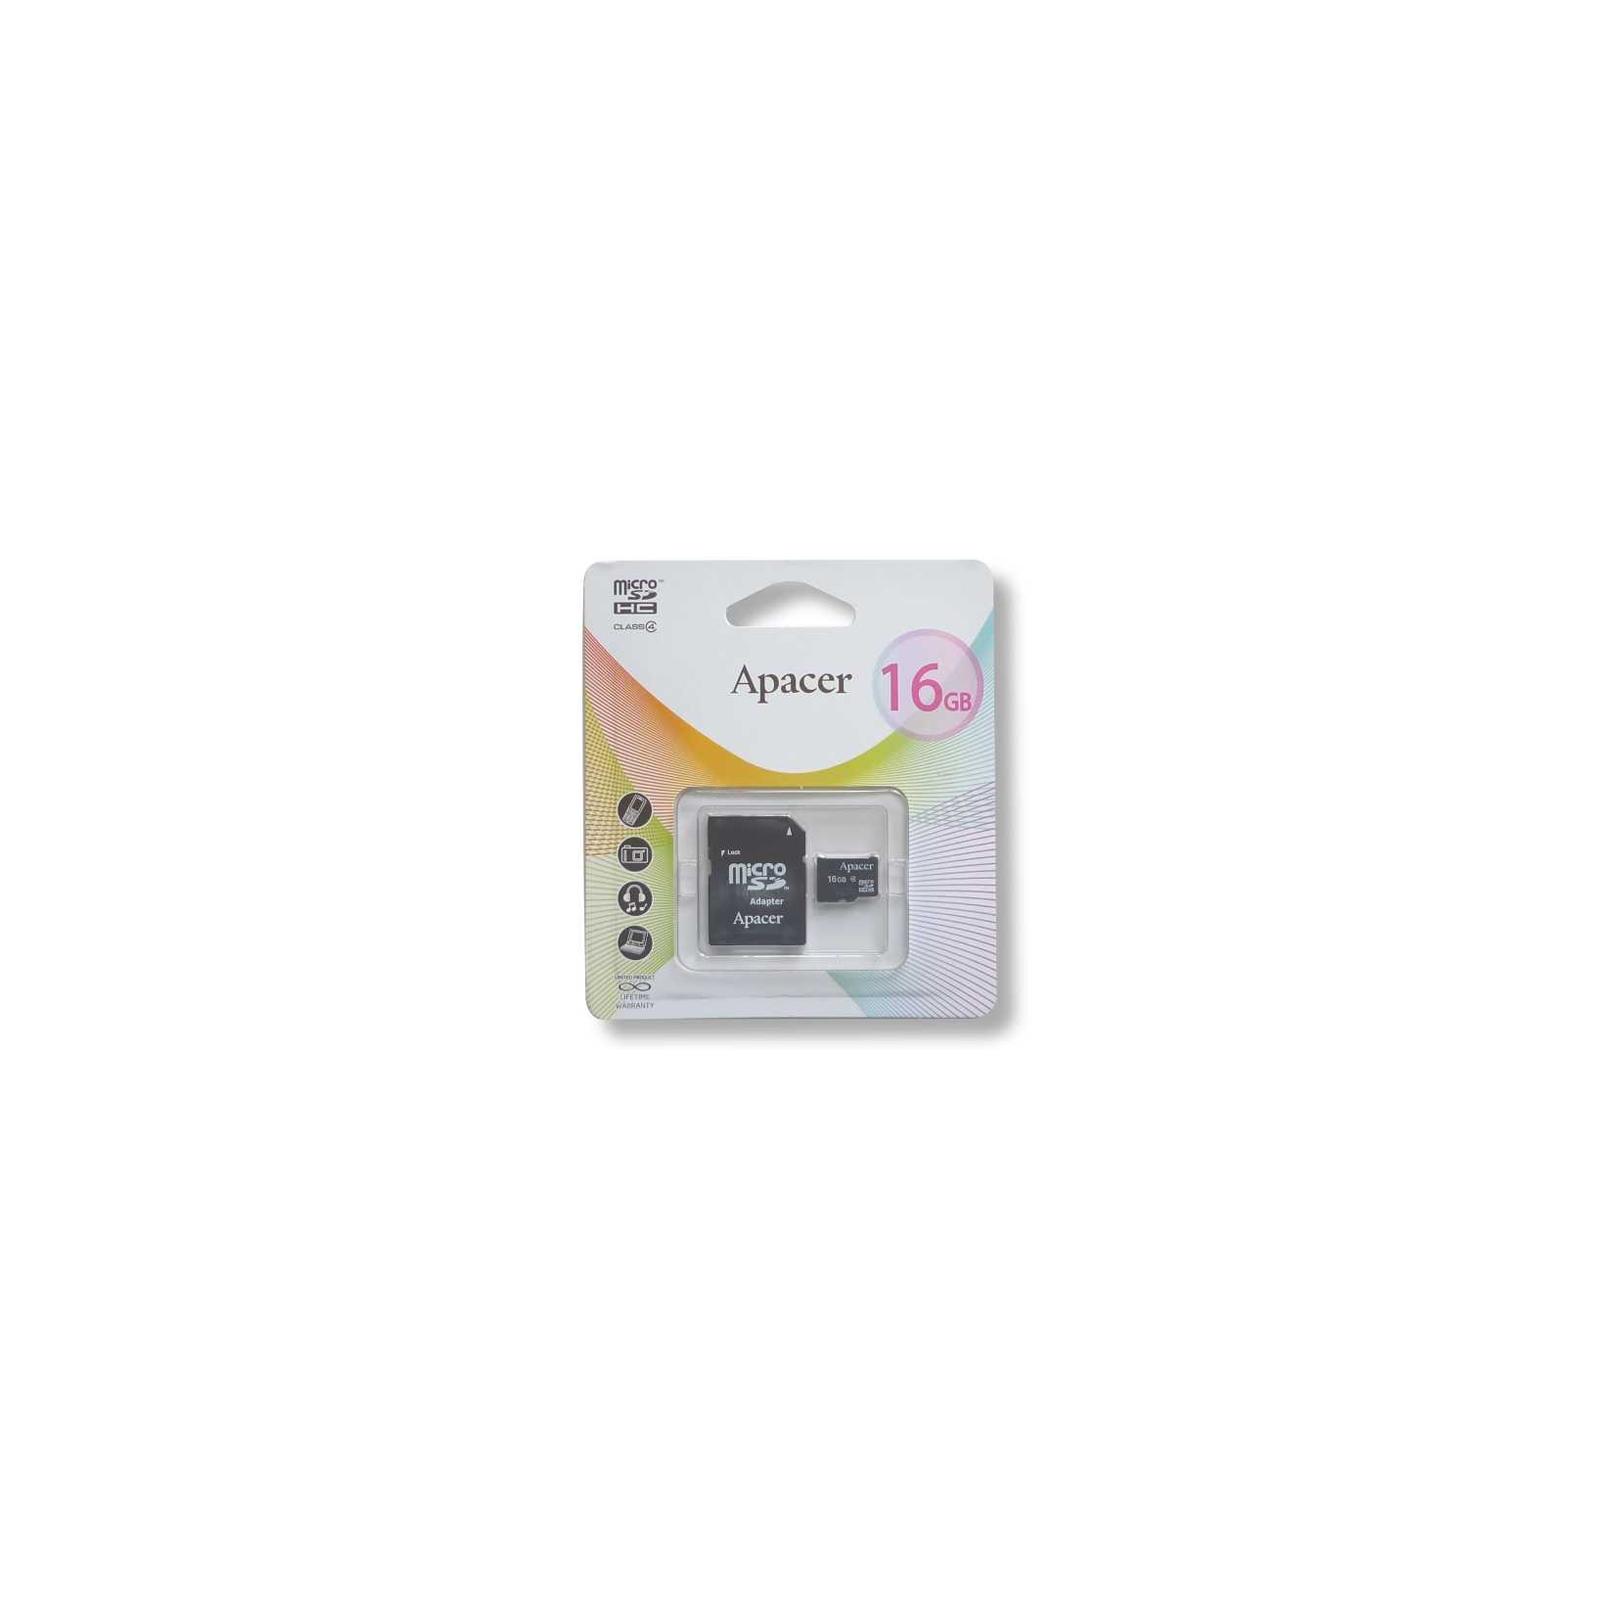 Карта памяти Apacer microSDHC Class4 16GB w/ 1 Adapter RP (AP16GMCSH4-R) изображение 2